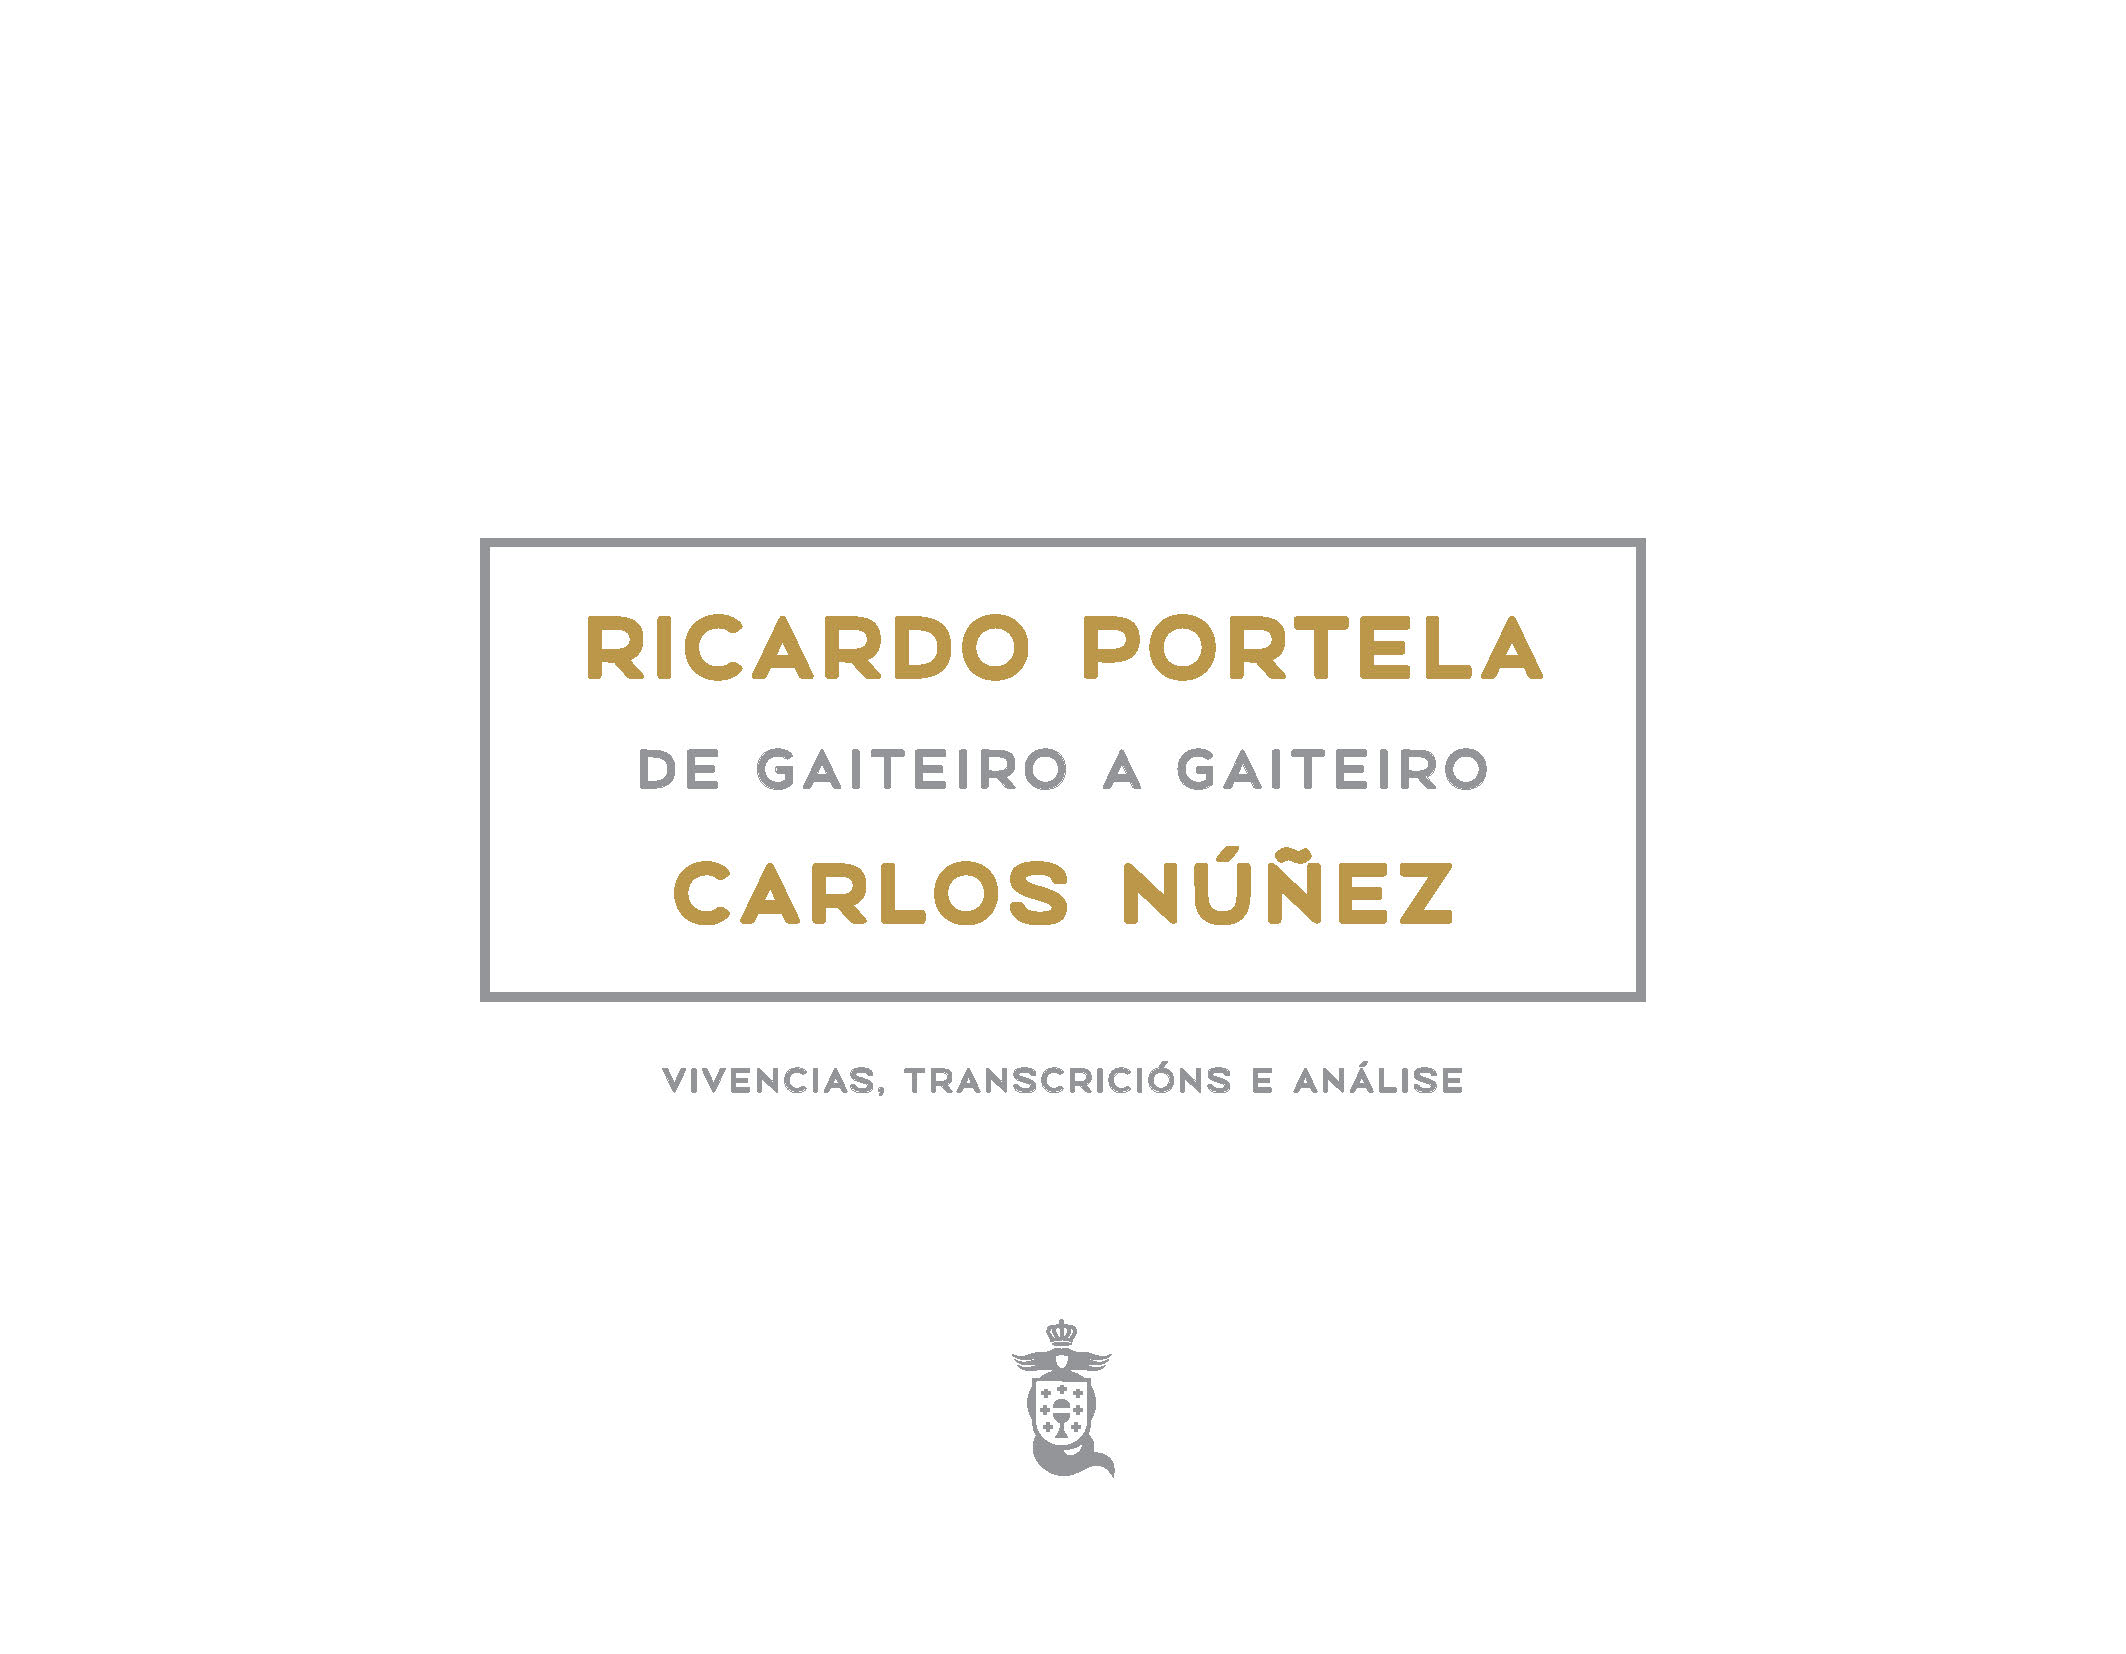 http://consellodacultura.gal/mediateca/extras/CCG_2020_Ricardo-Portela-De-gaiteiro-a-gaiteiro.jpg